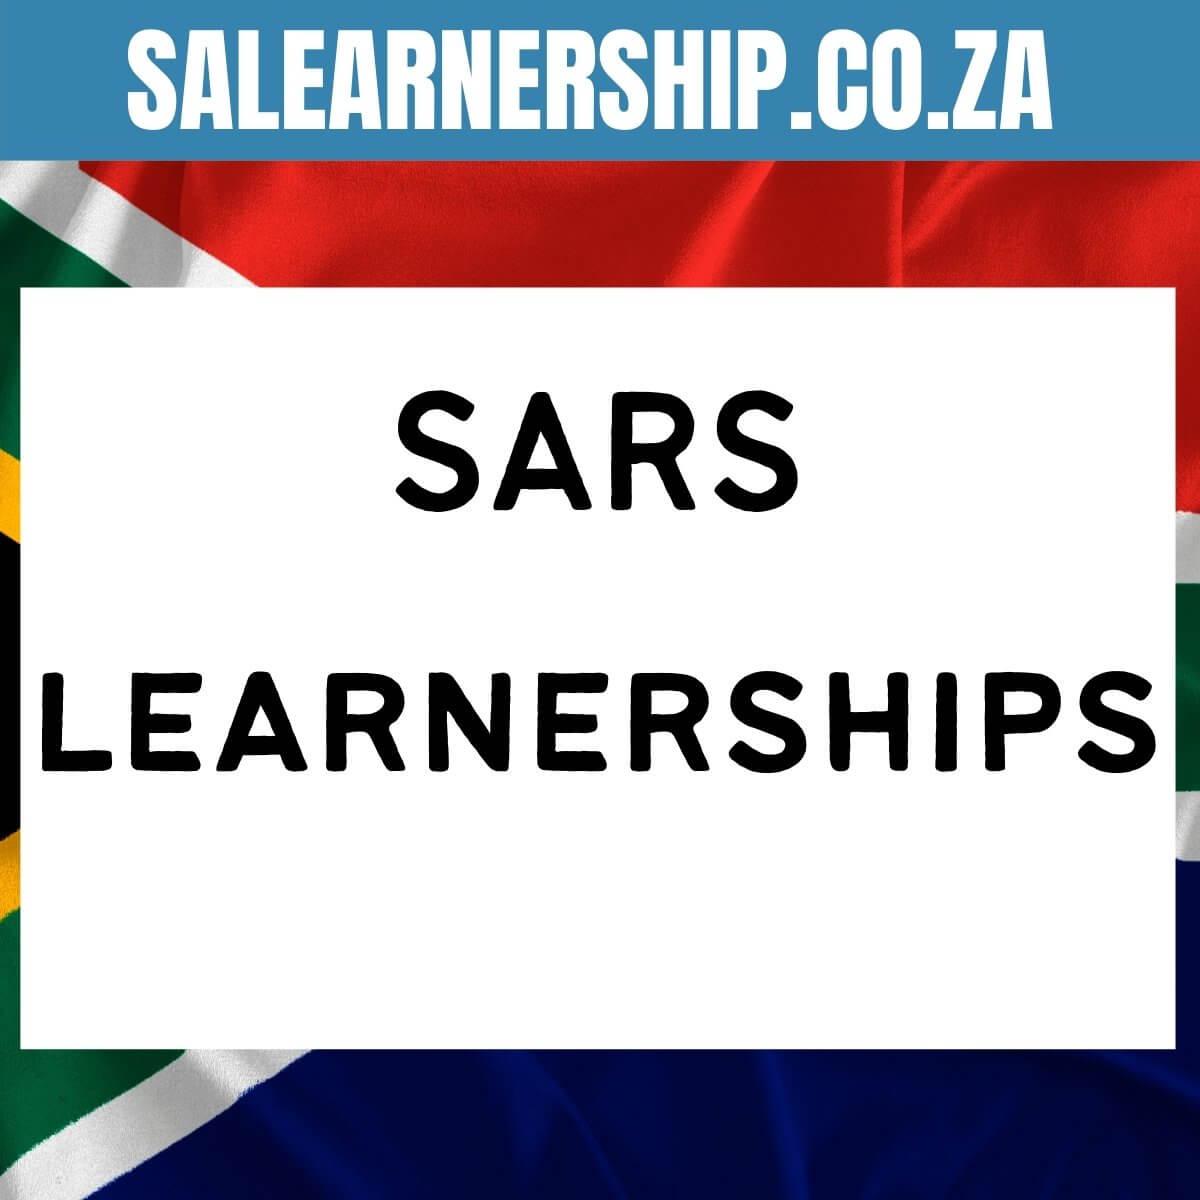 SARS learnerships